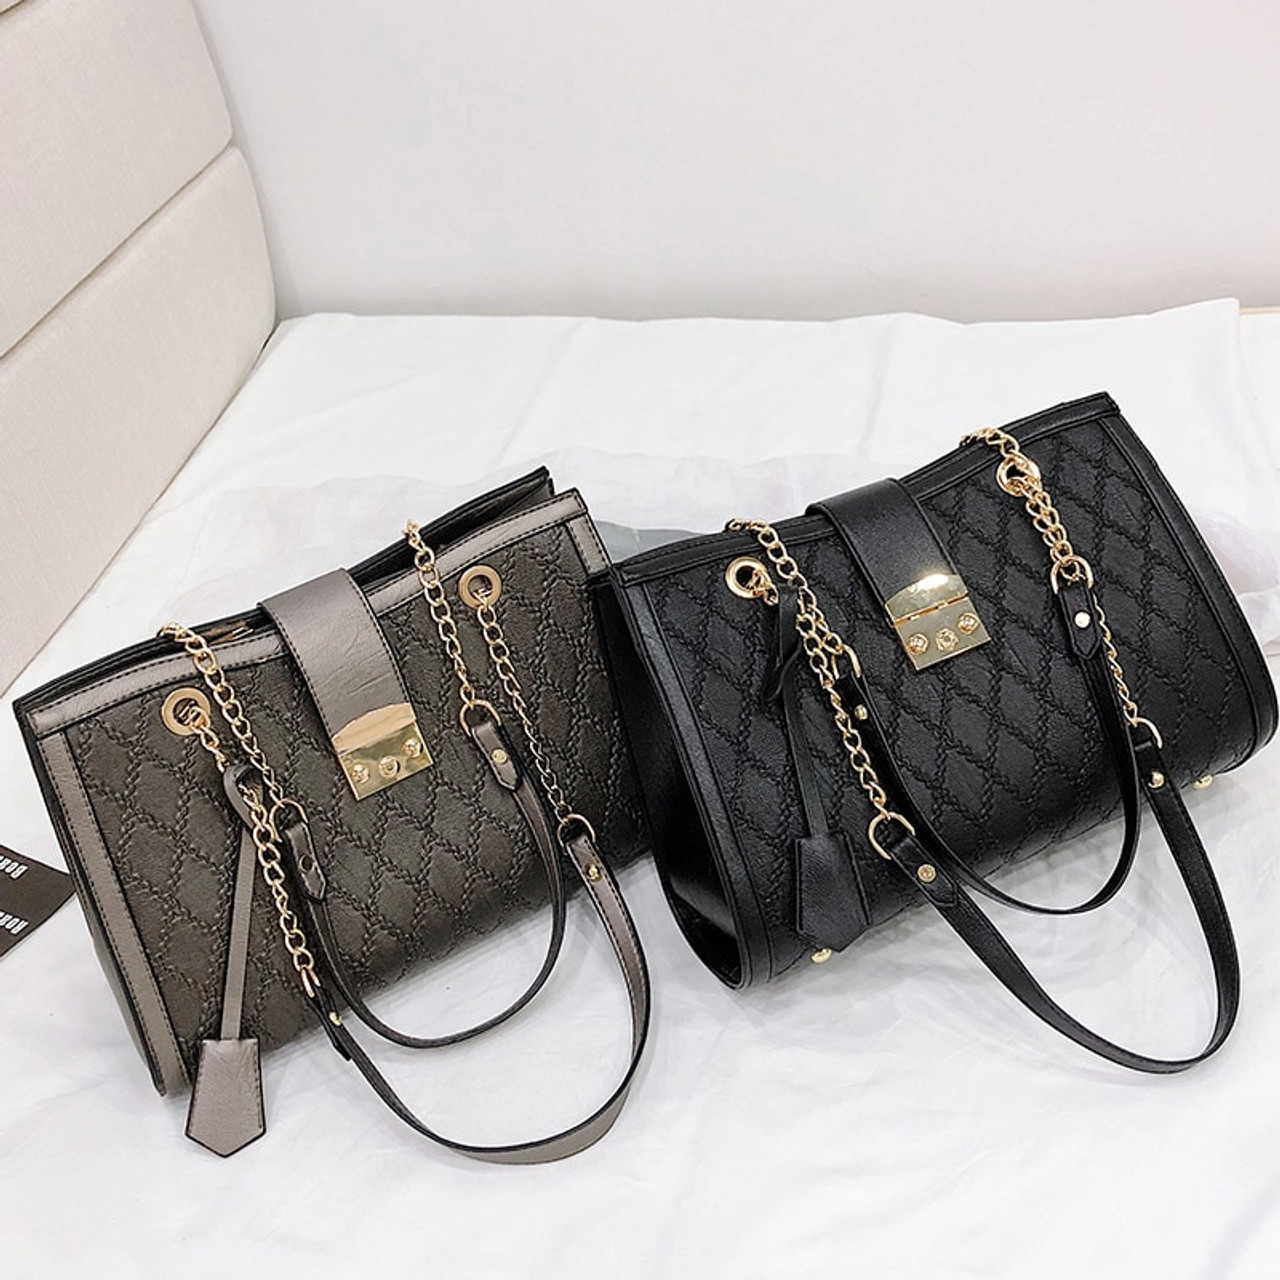 ... Sac Femme Famous Brand Luxury Handbags Women Bags Designer Female  Leather Shoulder Bag Ladies Elegant Messenger ... 8be22dd921